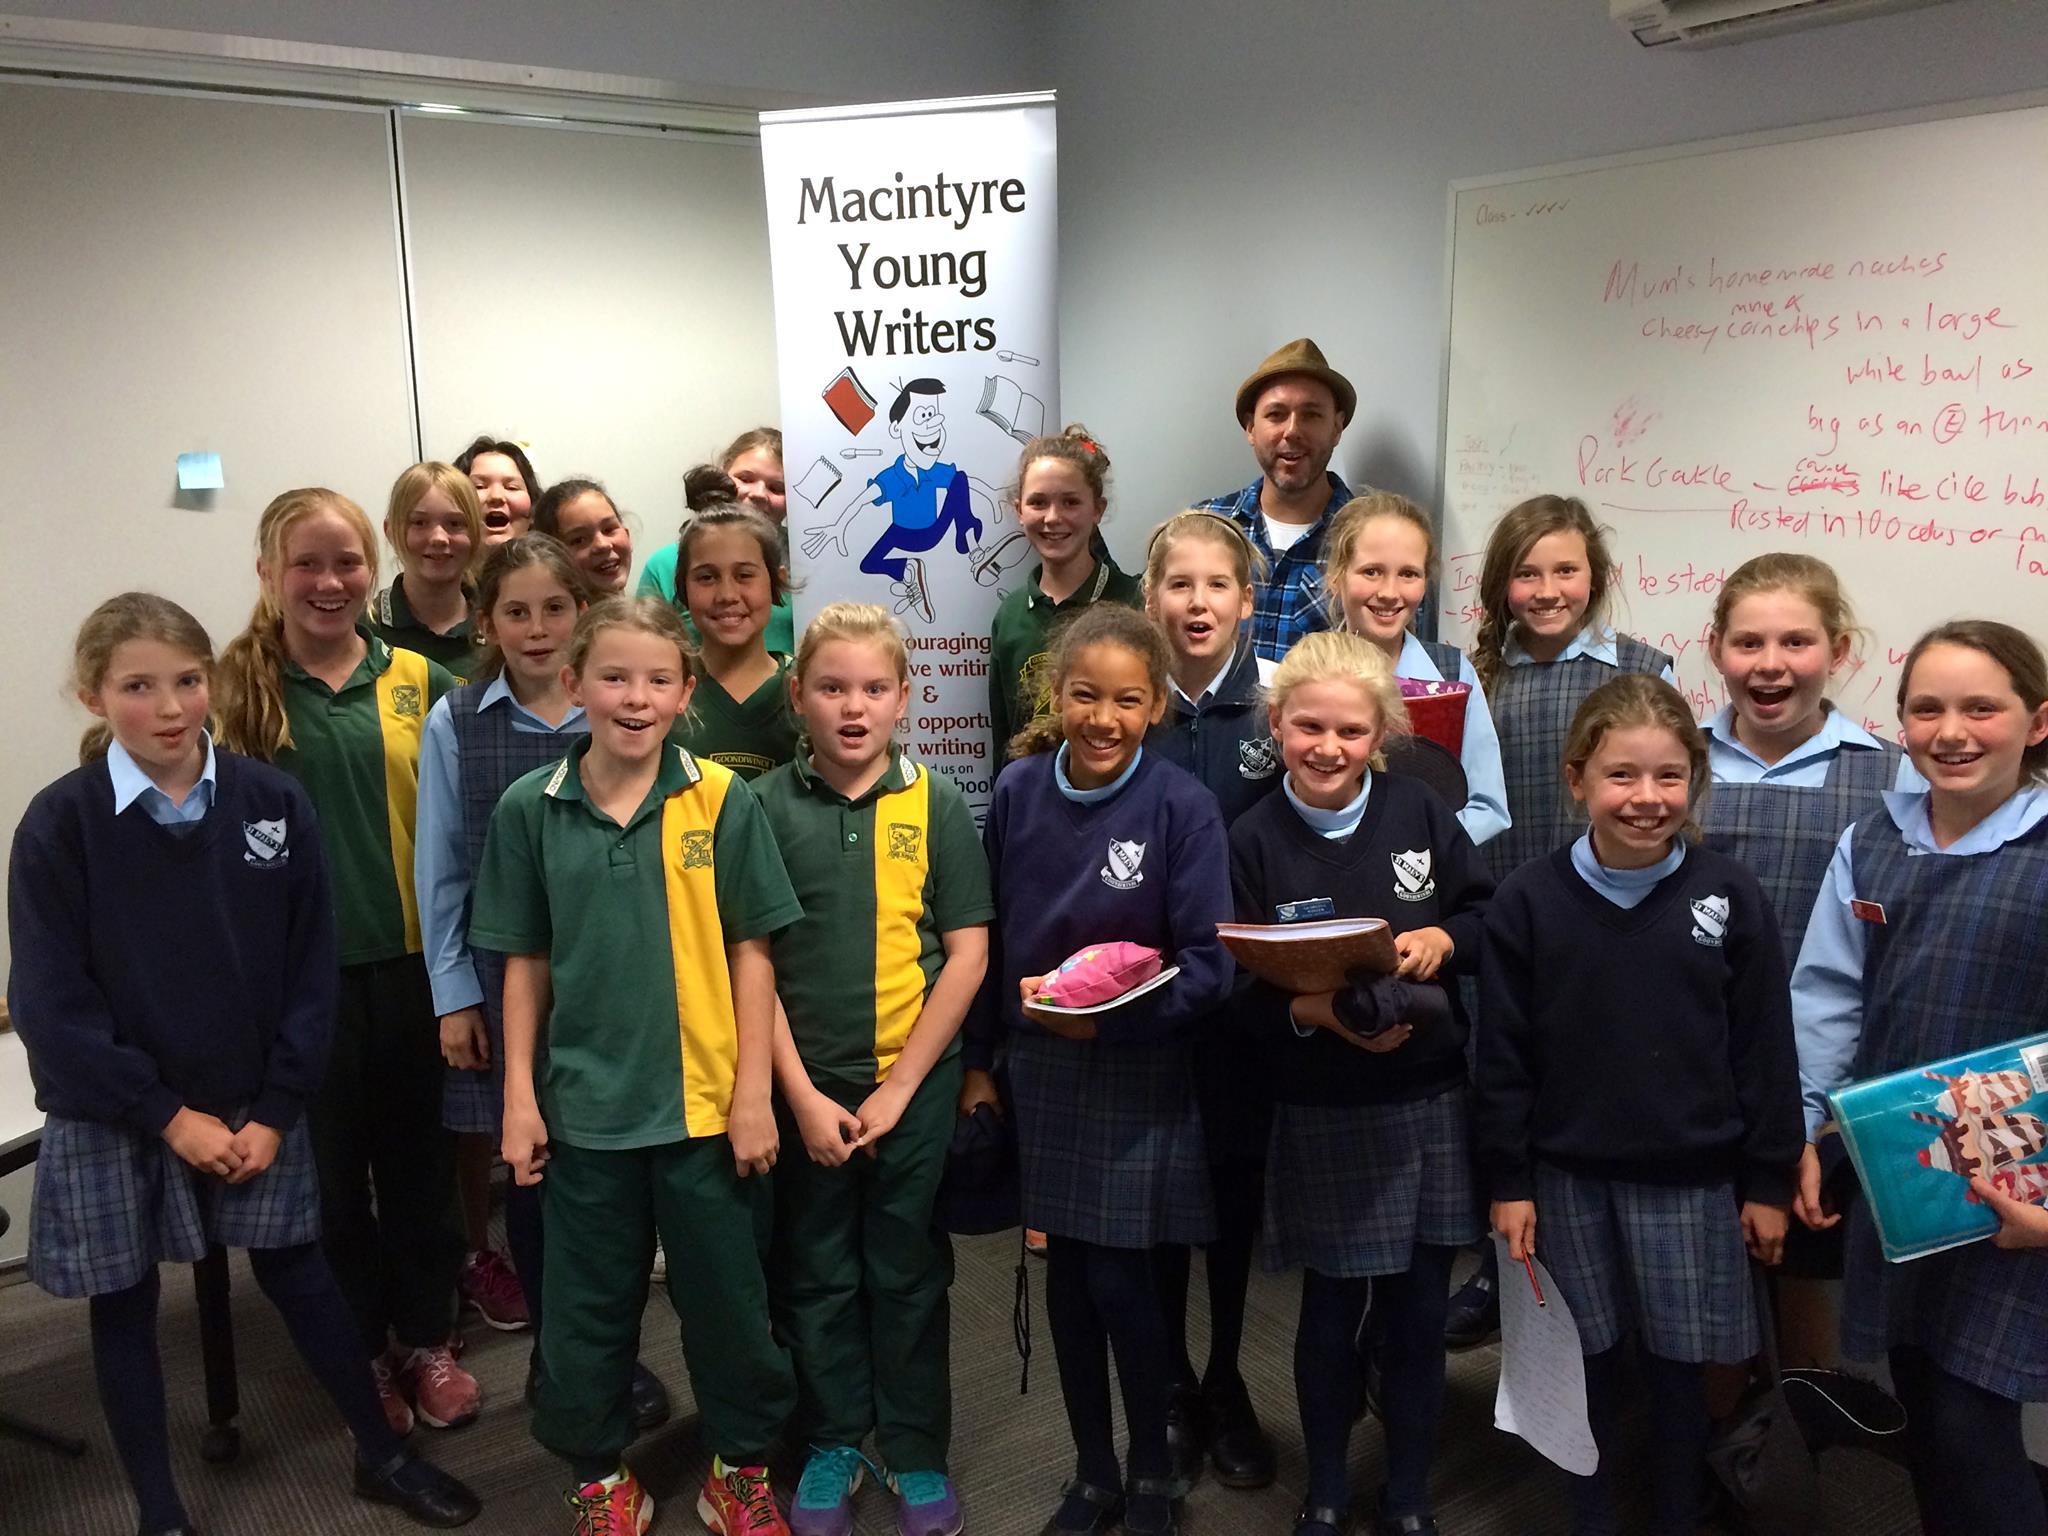 Macintyre Young Writers